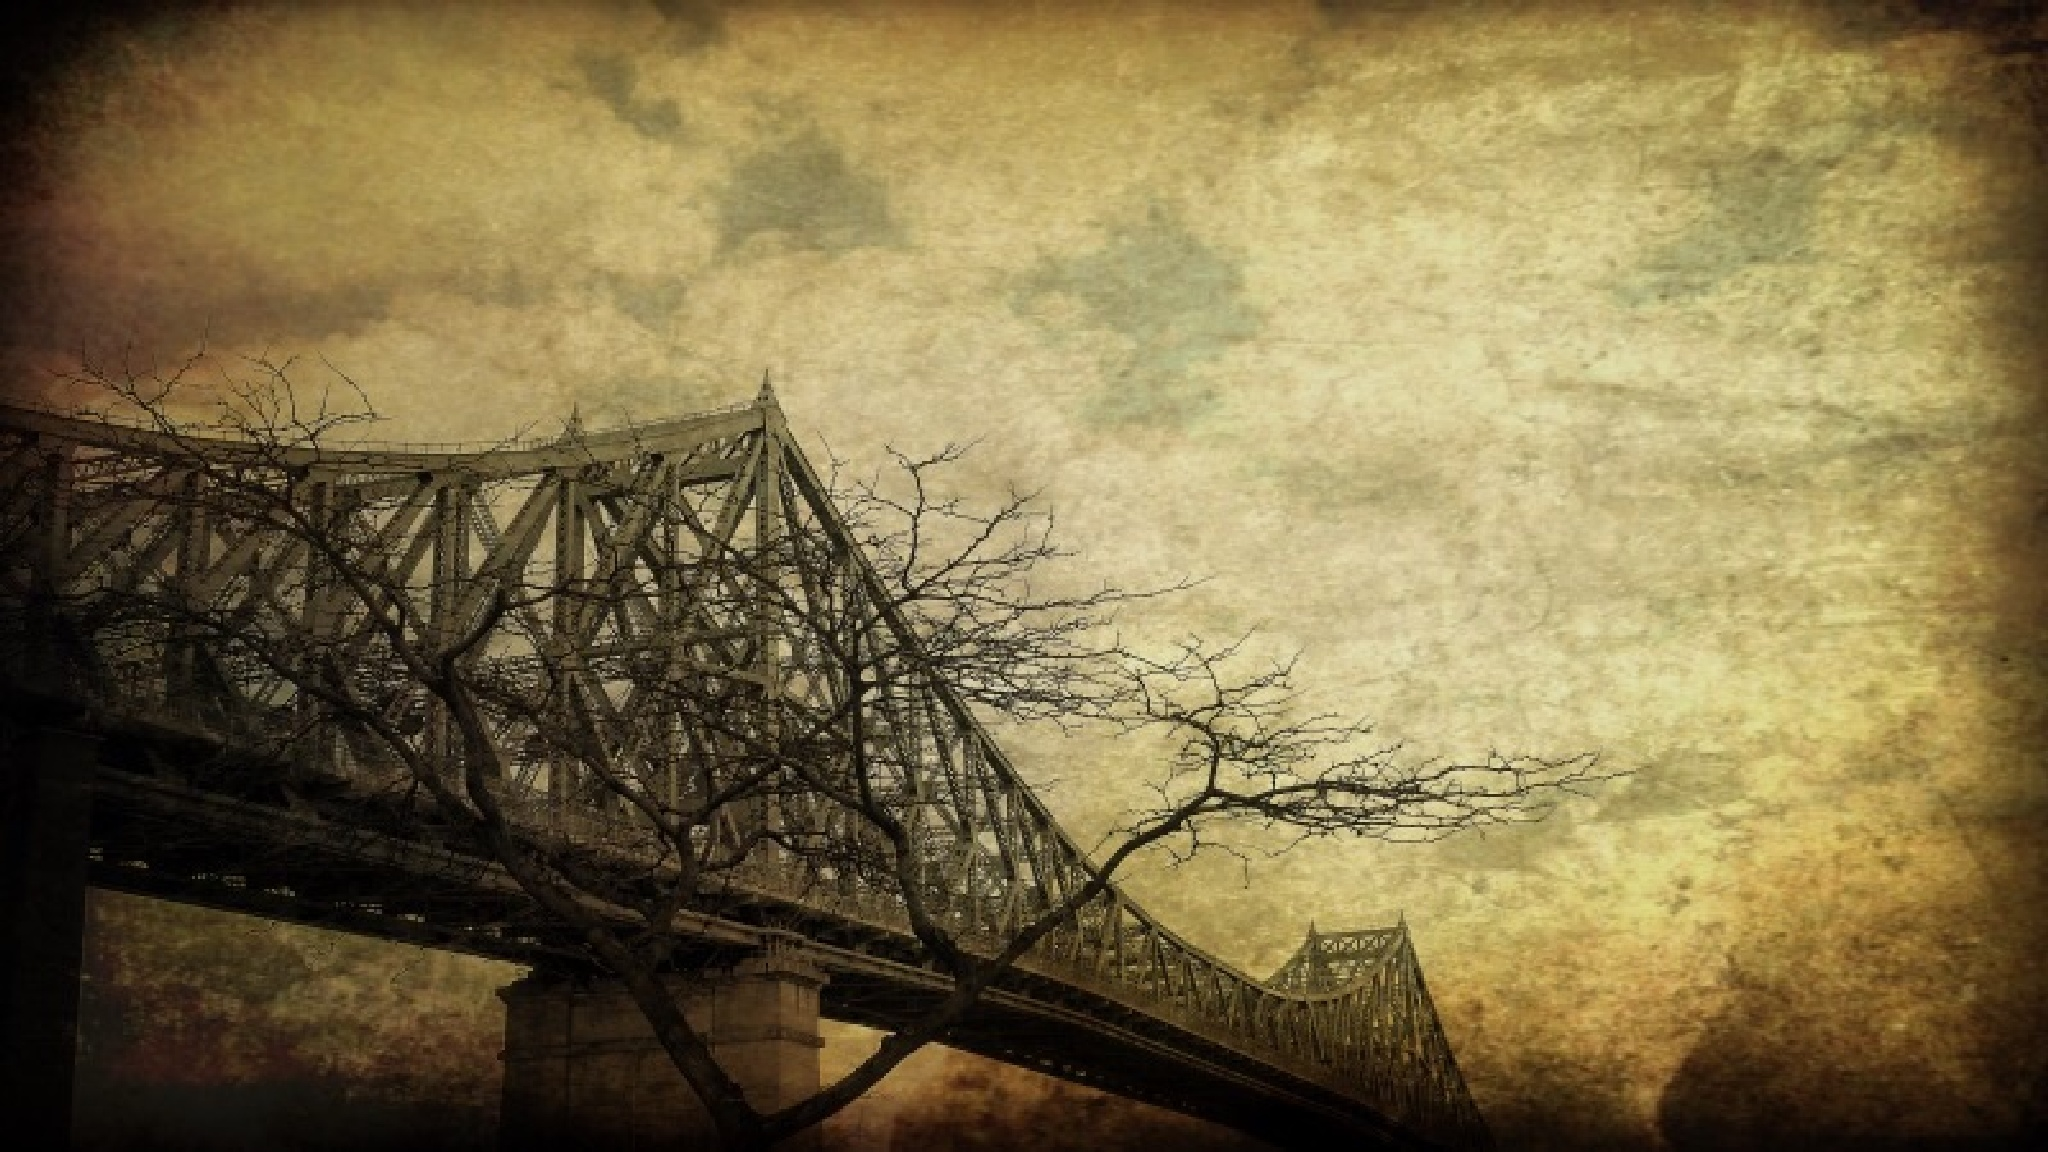 Montreal. Jacques-Cartier bridge  by tikotak2014